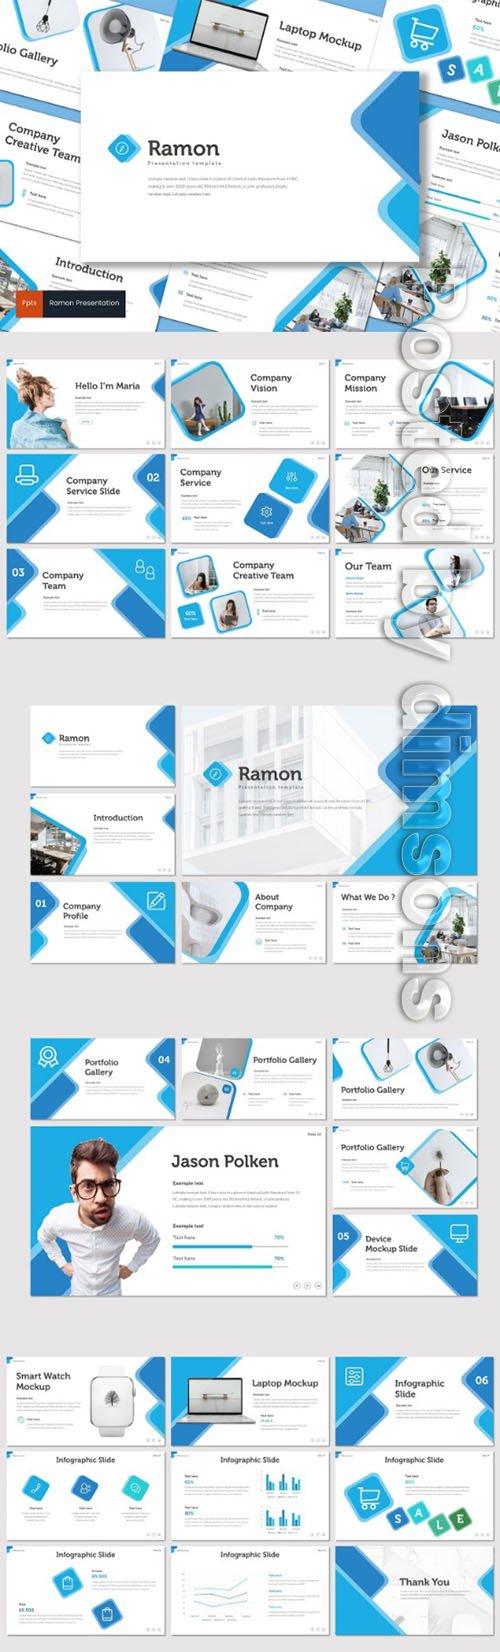 Ramon - PowerPoint, Keynote and Google Slides Templates